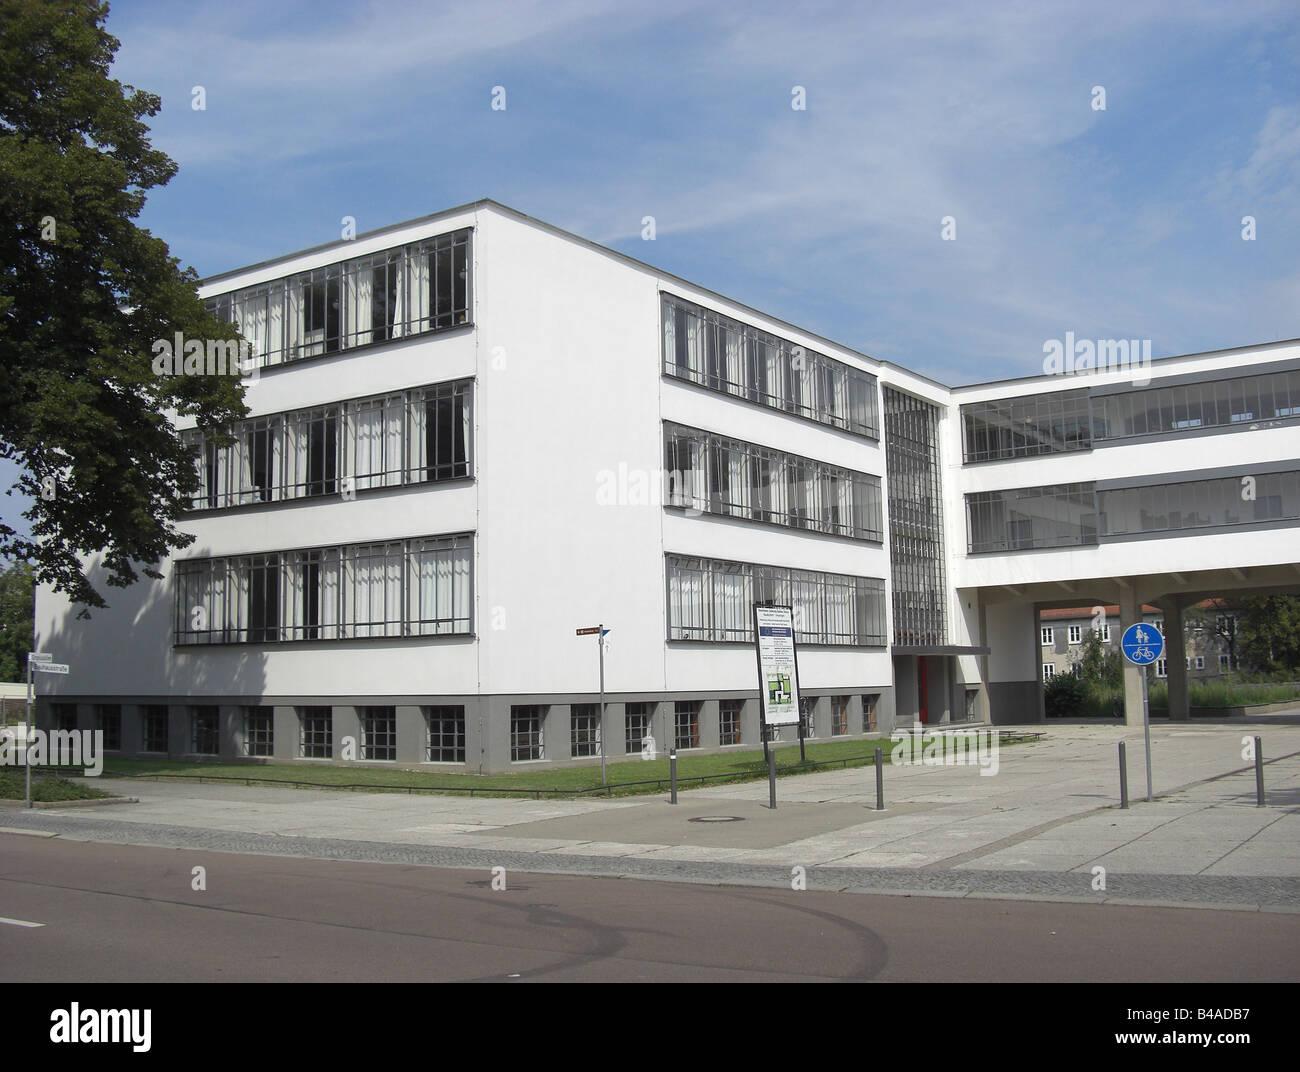 geography / travel, Germany, Saxony-Anhalt, Dessau, buidlings, Bauhaus, built: 1925 - 1926 by Walter Gropius, exterior - Stock Image